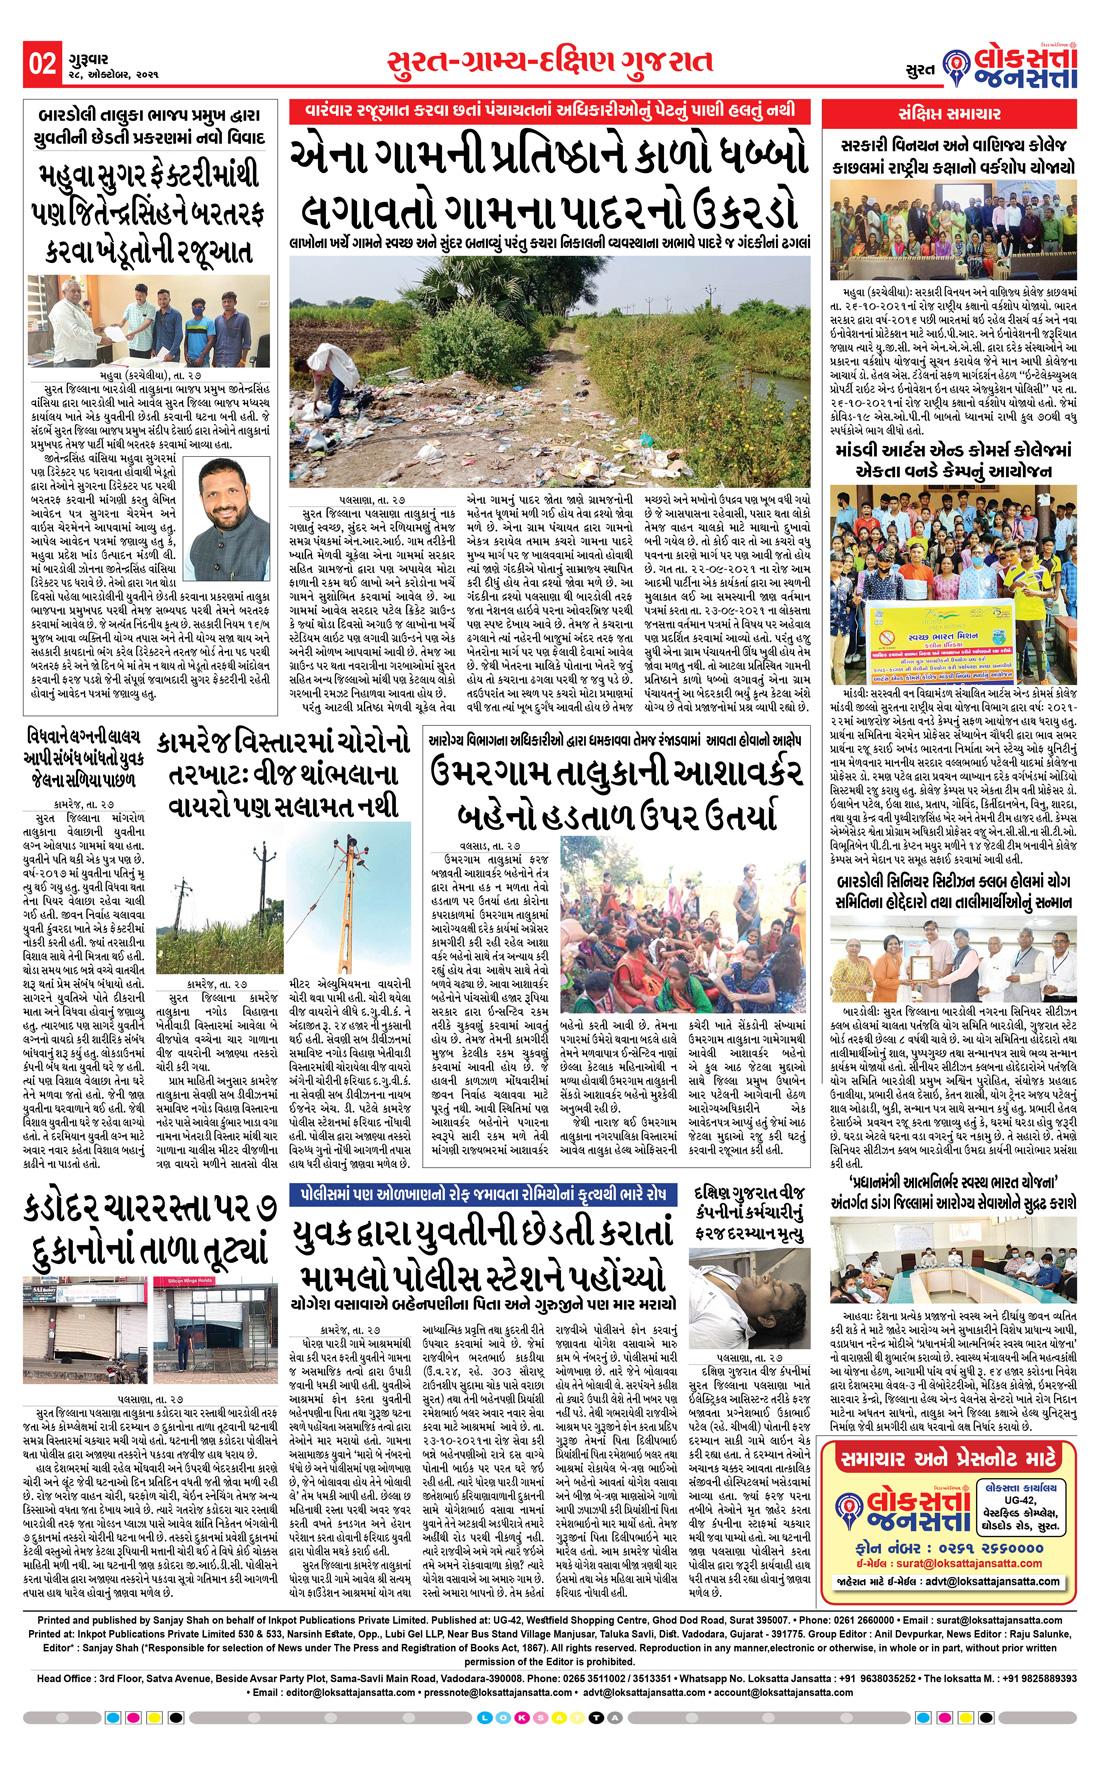 Loksatta Jansatta News Papaer E-paper dated 2021-10-28   Page 2